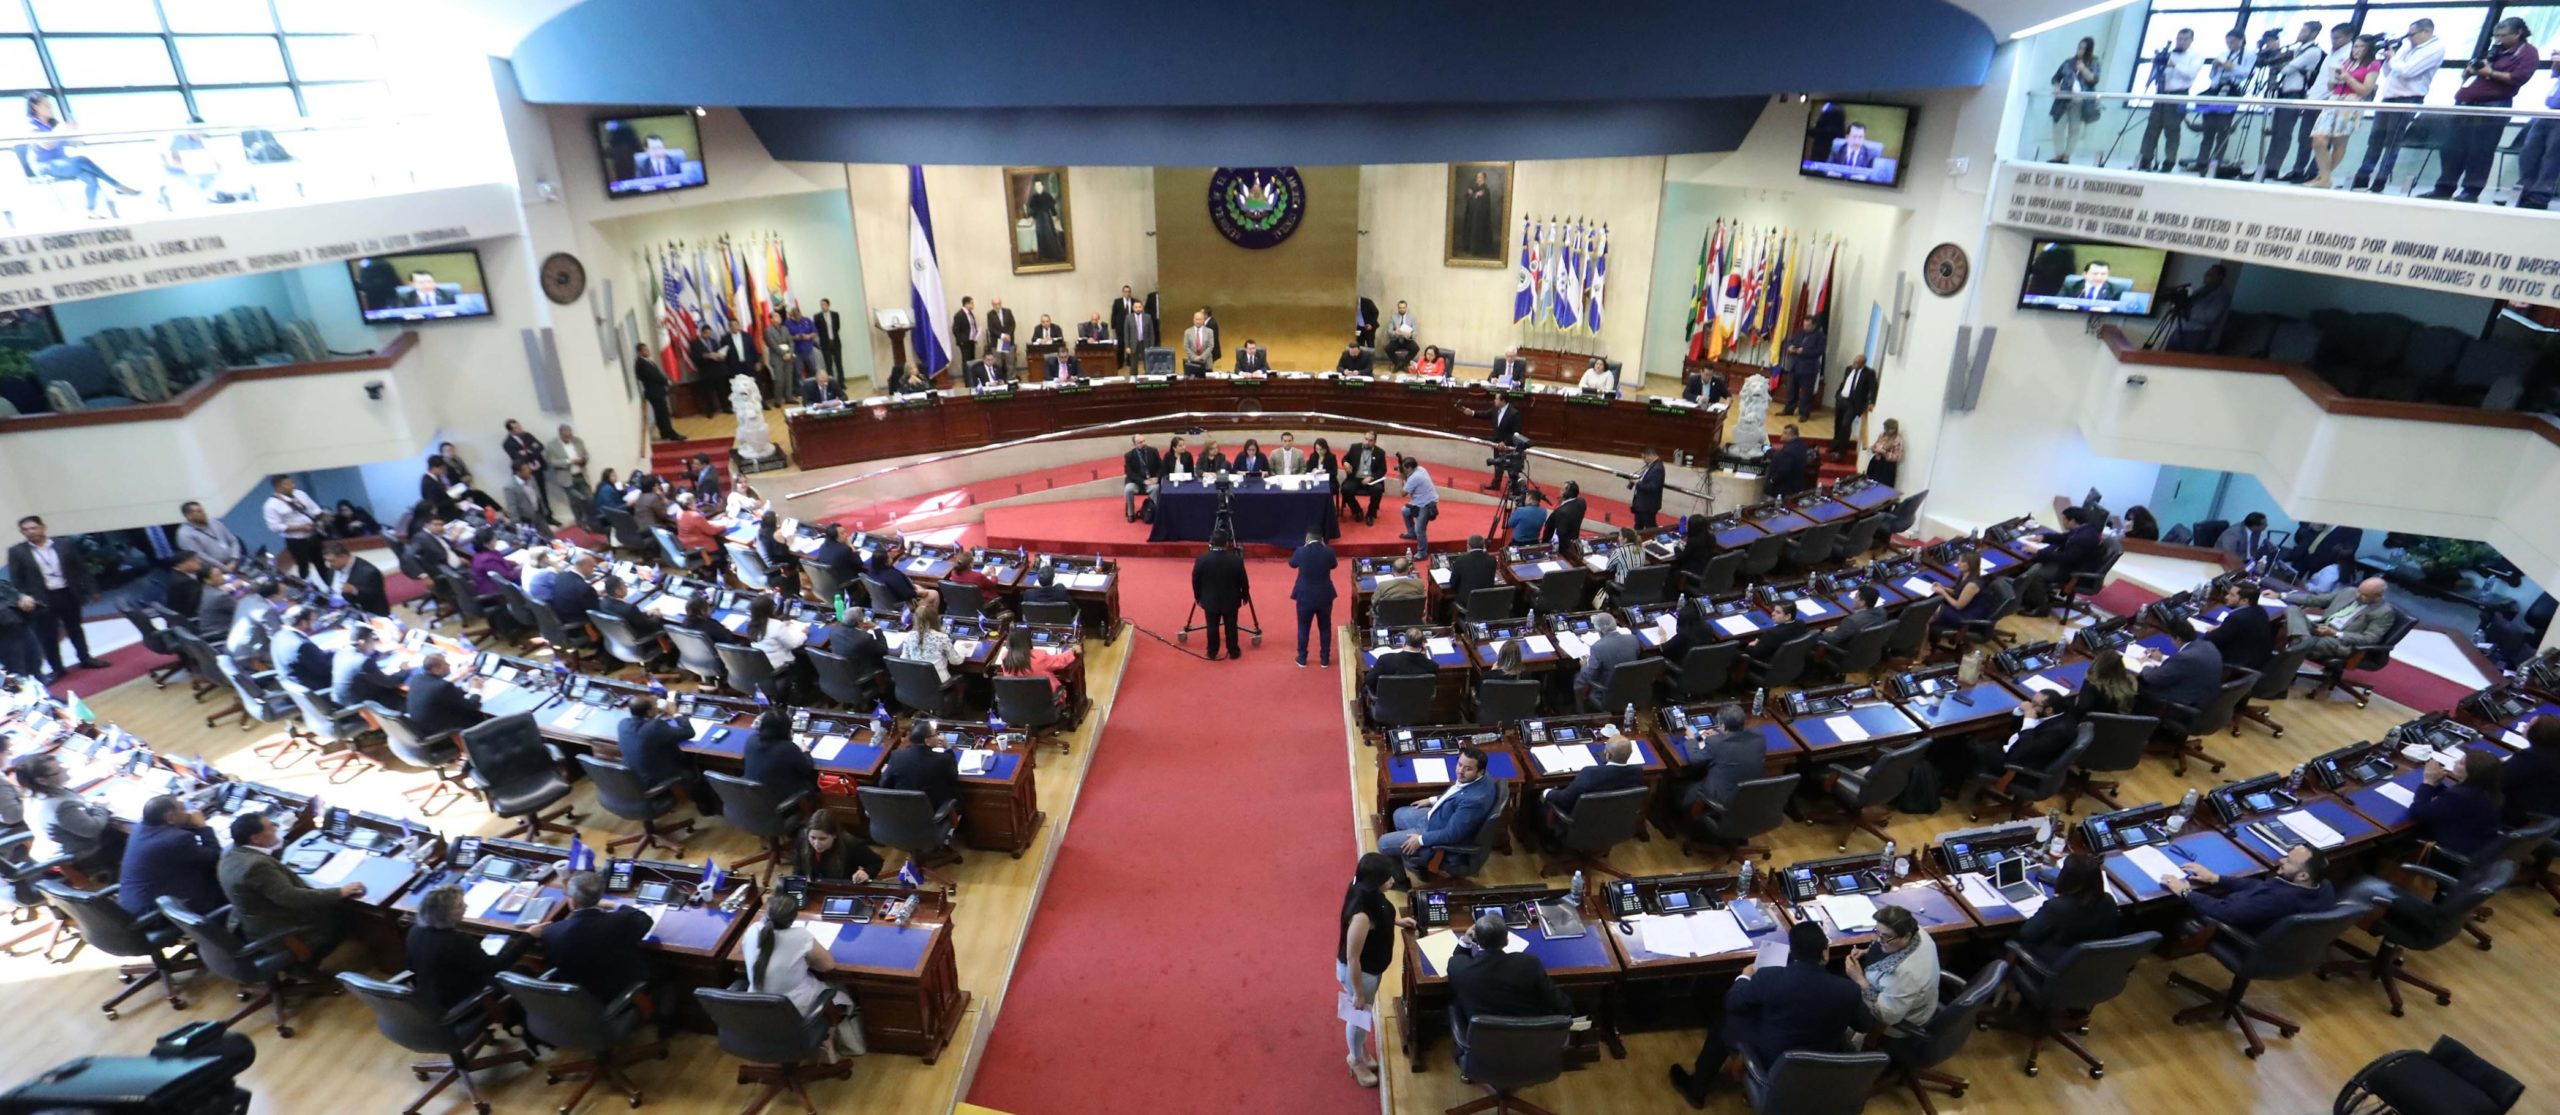 Finaliza interpelación a titular de Salud. Presidente Ponce convoca a sesión plenaria para interrogatorio al presidente de ANDA, hoy 4:00 p.m.